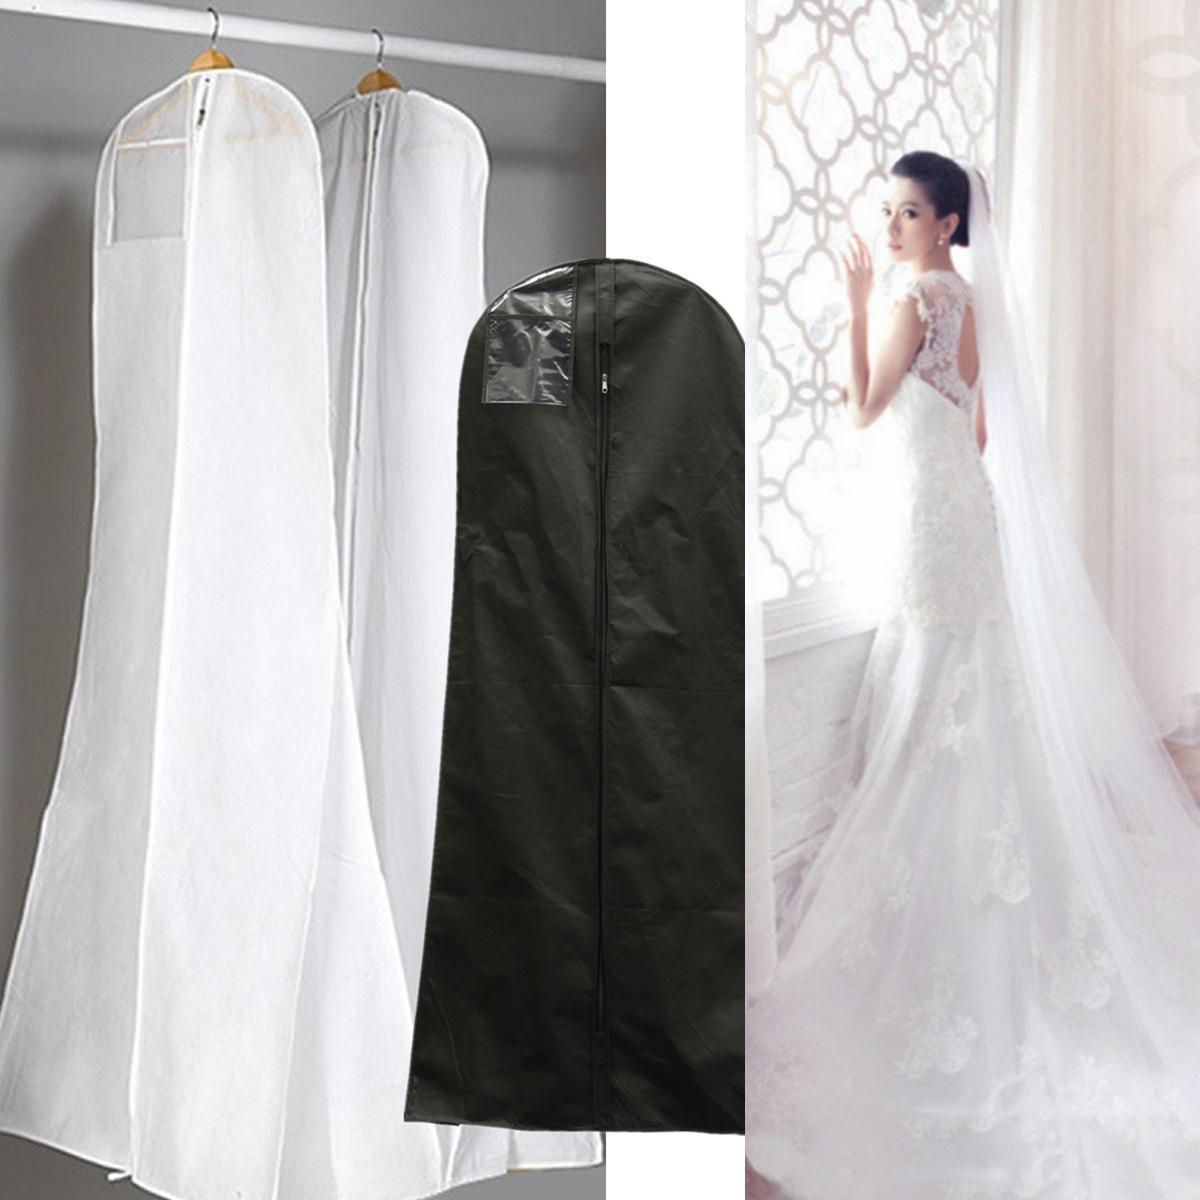 1 8m showerproof garment dress cover long bridal wedding for Storing wedding dress in garment bag